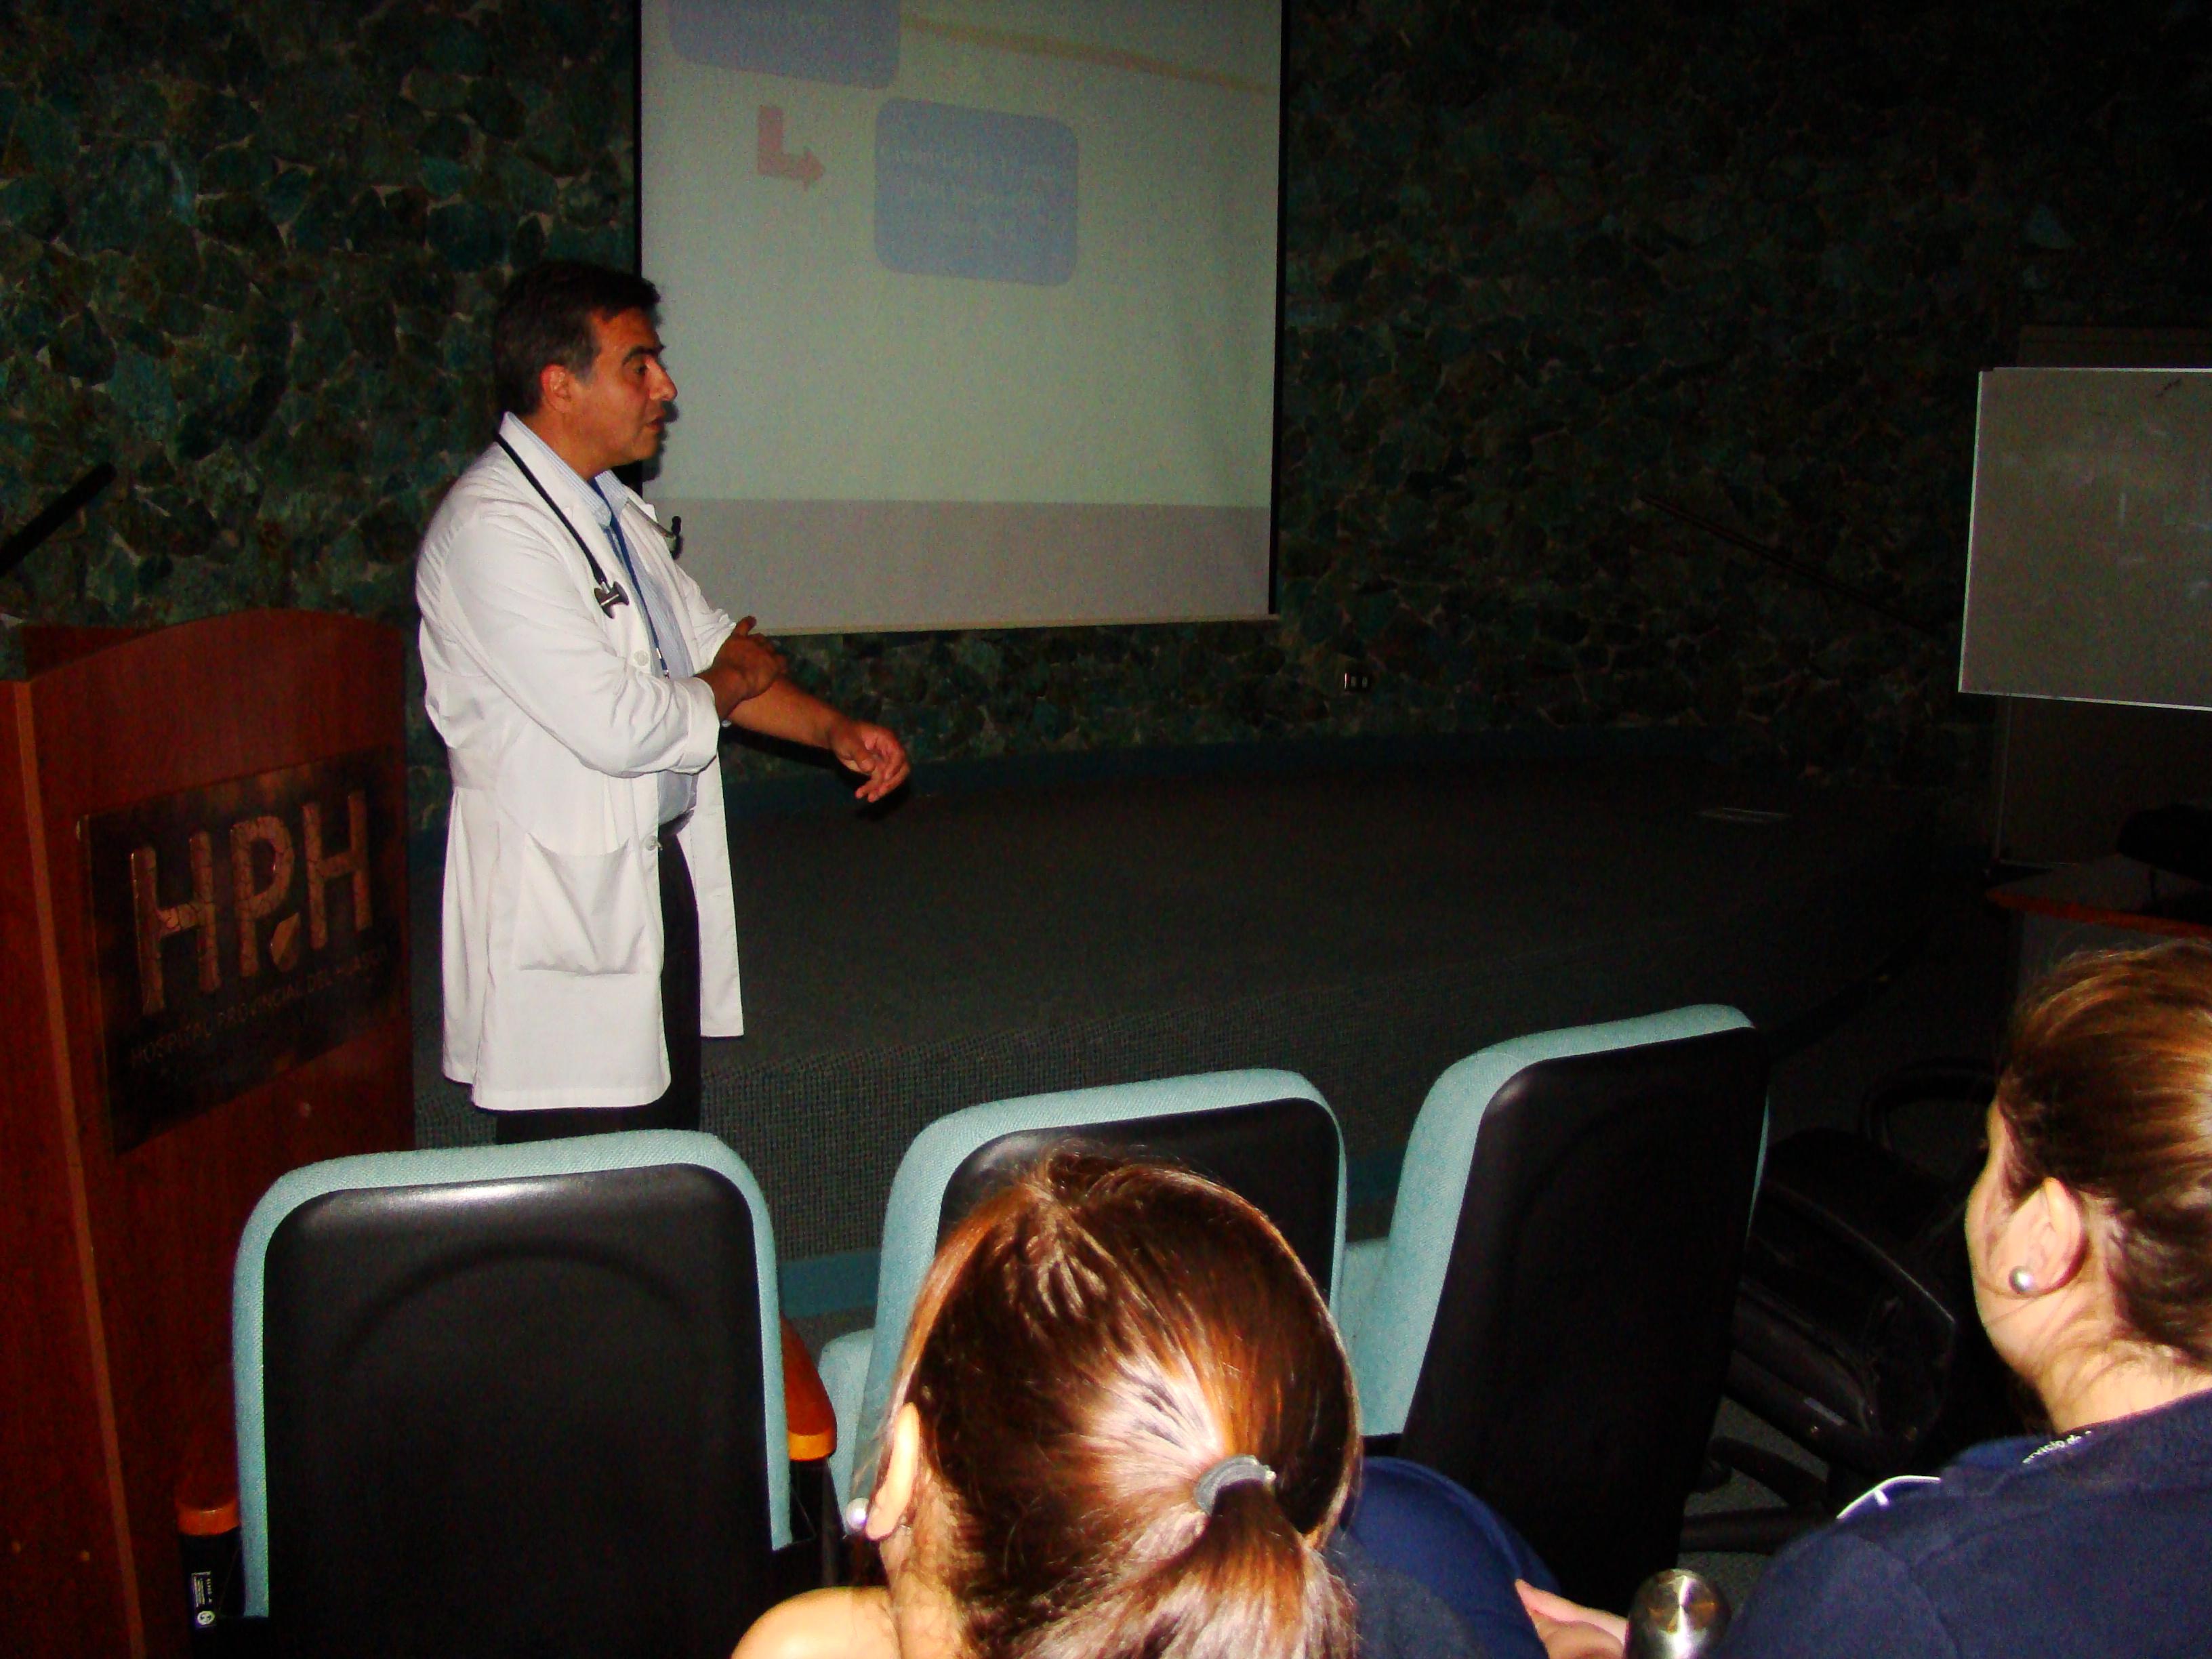 Hospital Provincial organiza Jornada Regional de enfermedades lisosomales en Vallenar